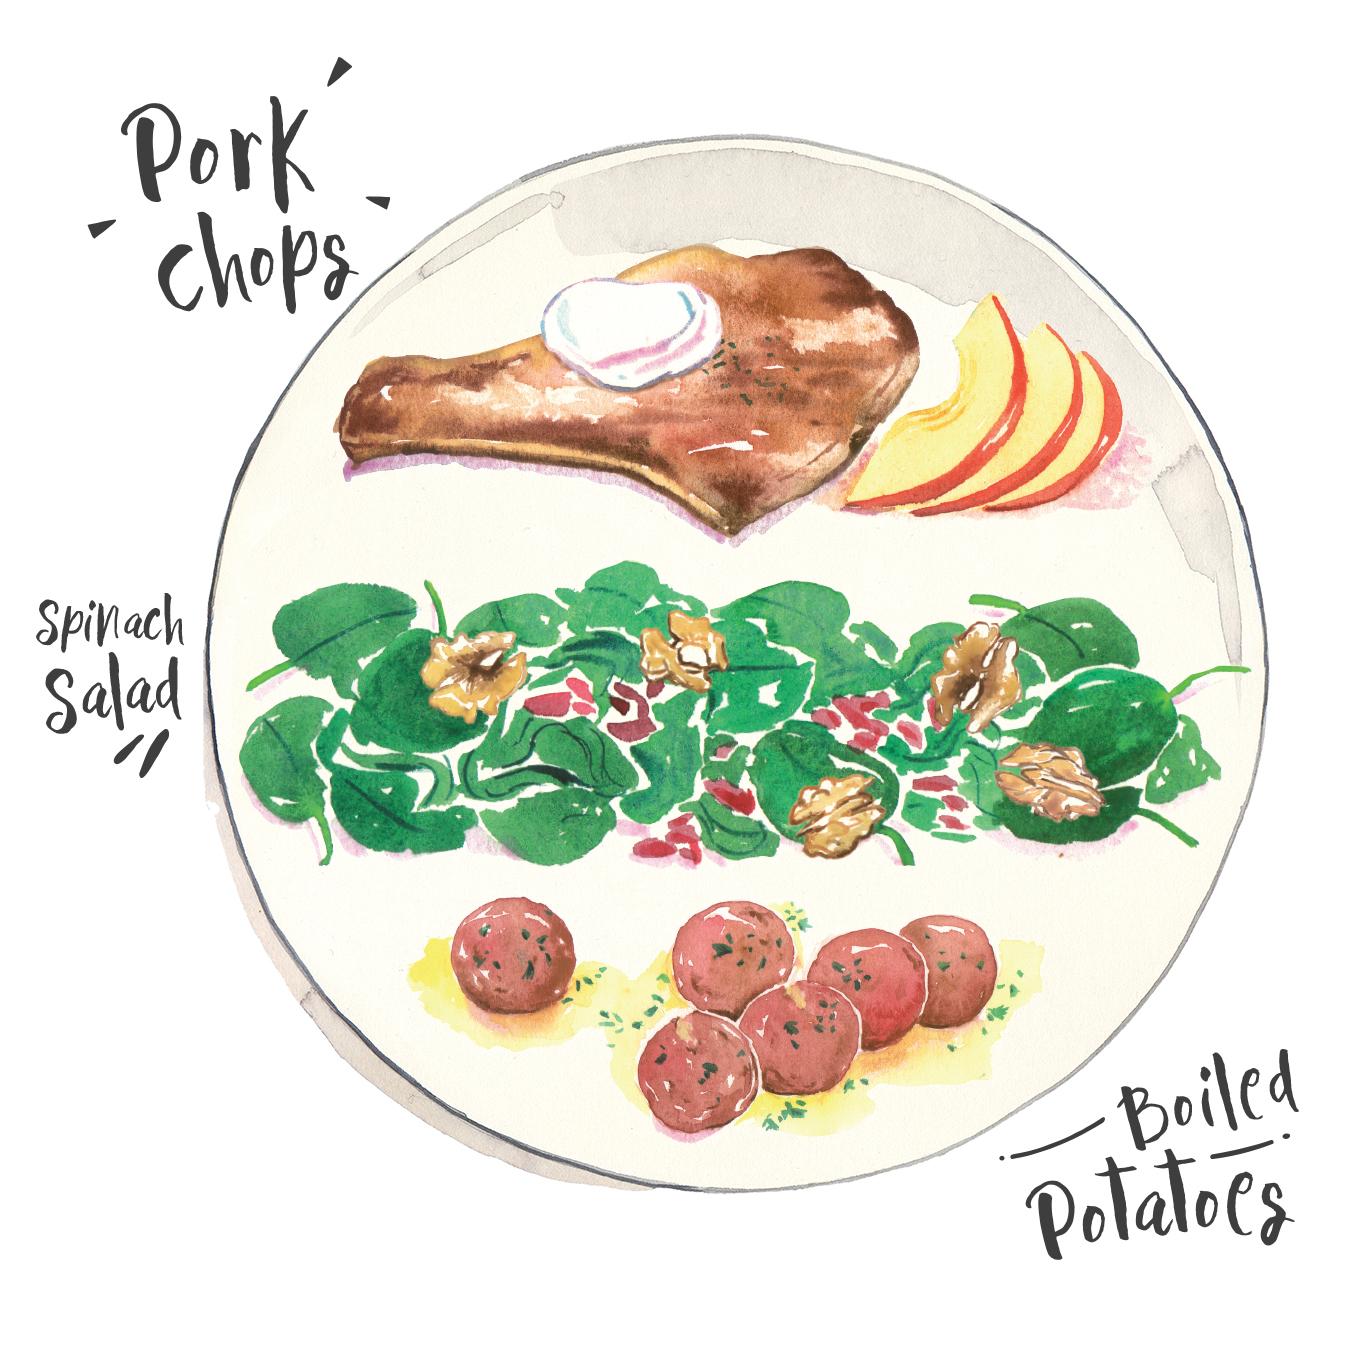 pork chops-spinach salad-boiled potatoes.jpg